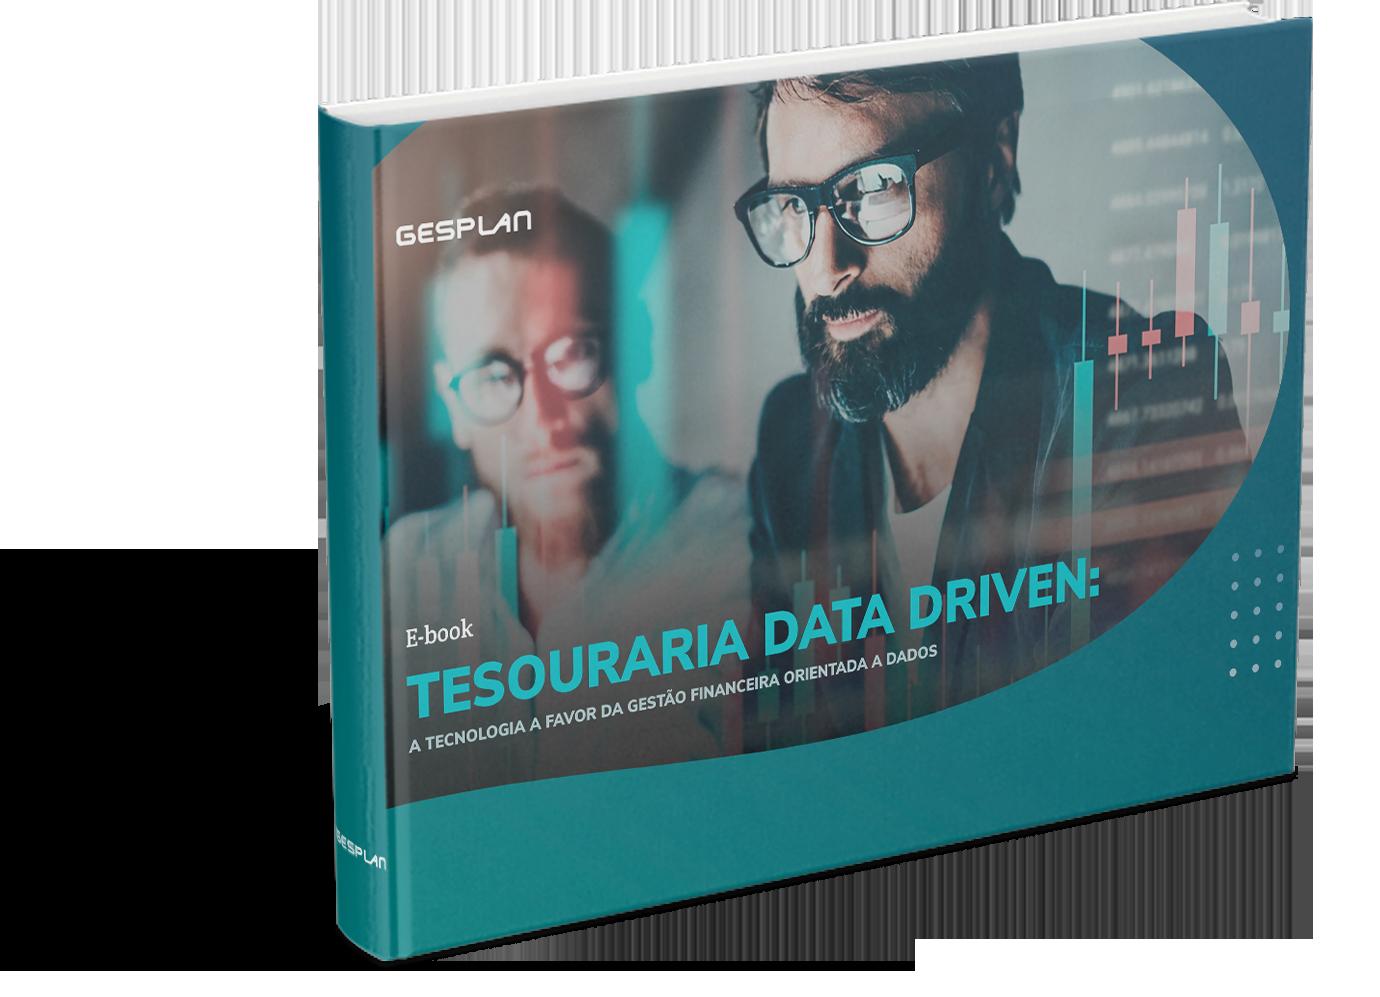 gesplan-ebook-guia-data-driven